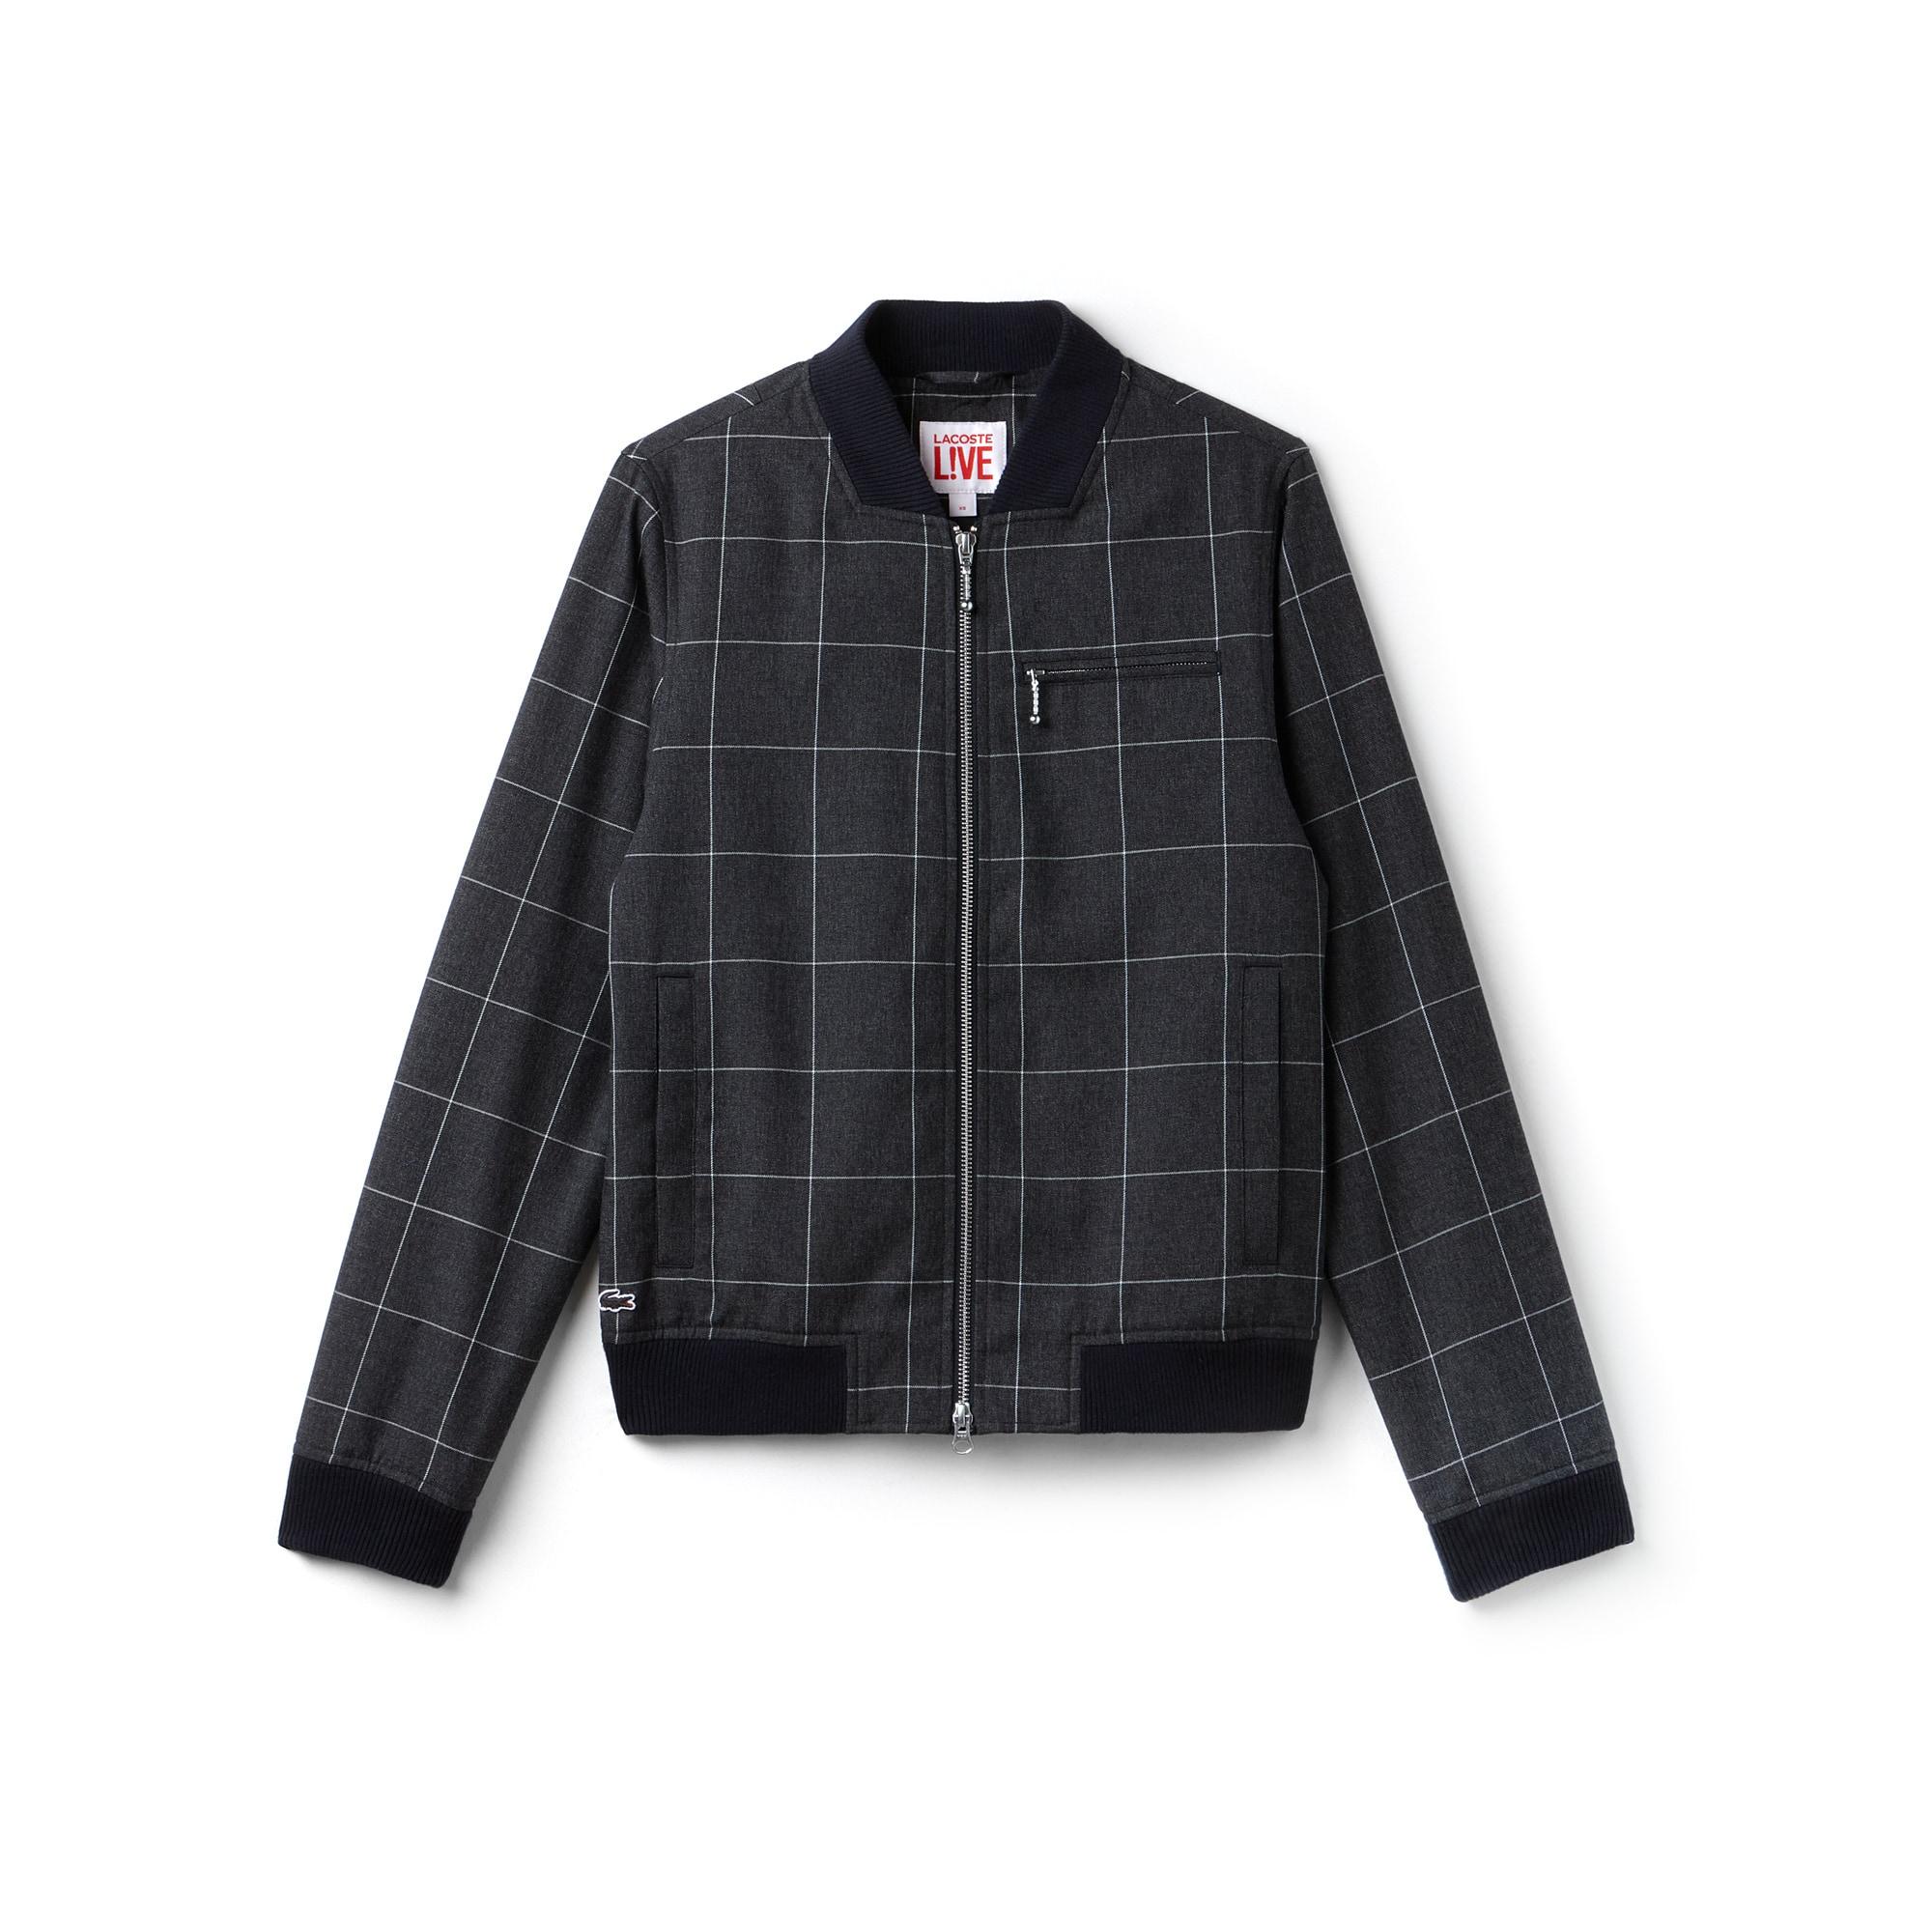 Unisex LIVE Check Flannel Bomber Jacket